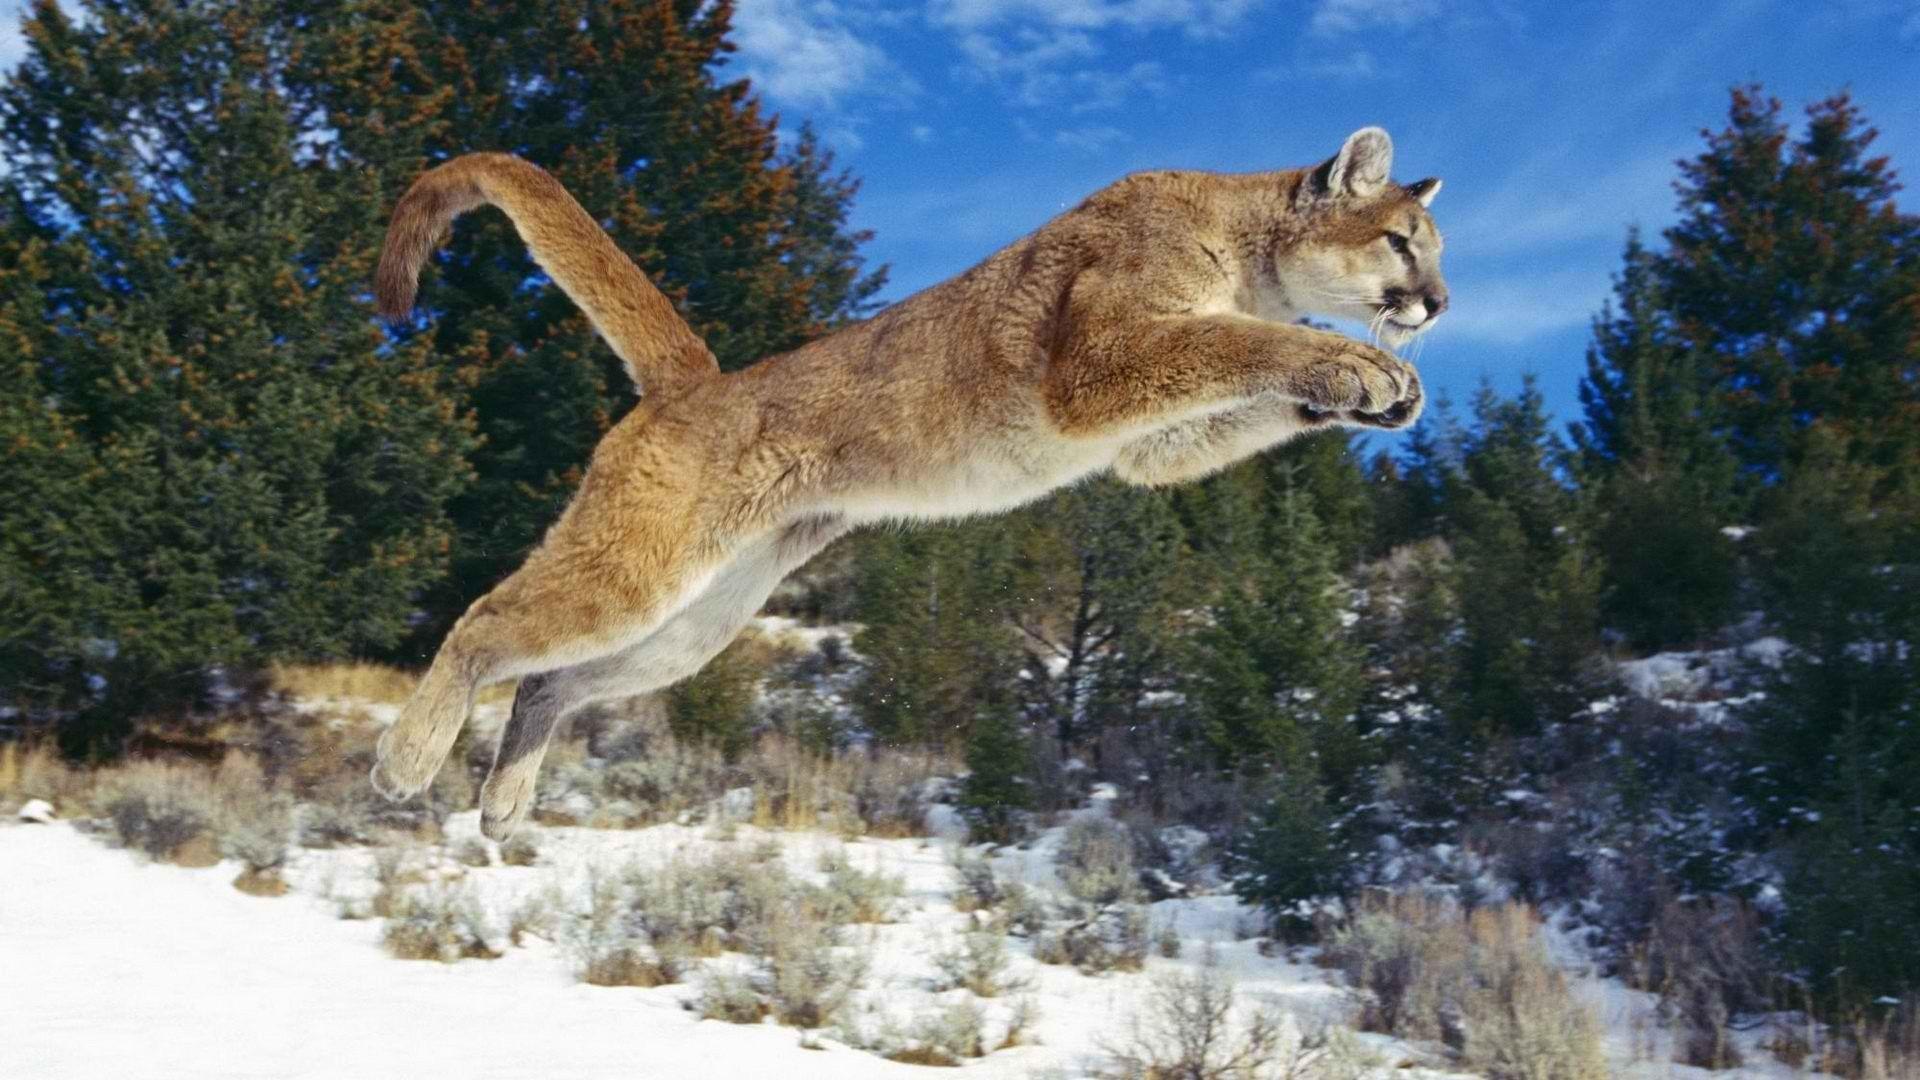 Download Wallpaper 1920x1080 Puma, Cougar, Mountain lion, Big cat ...